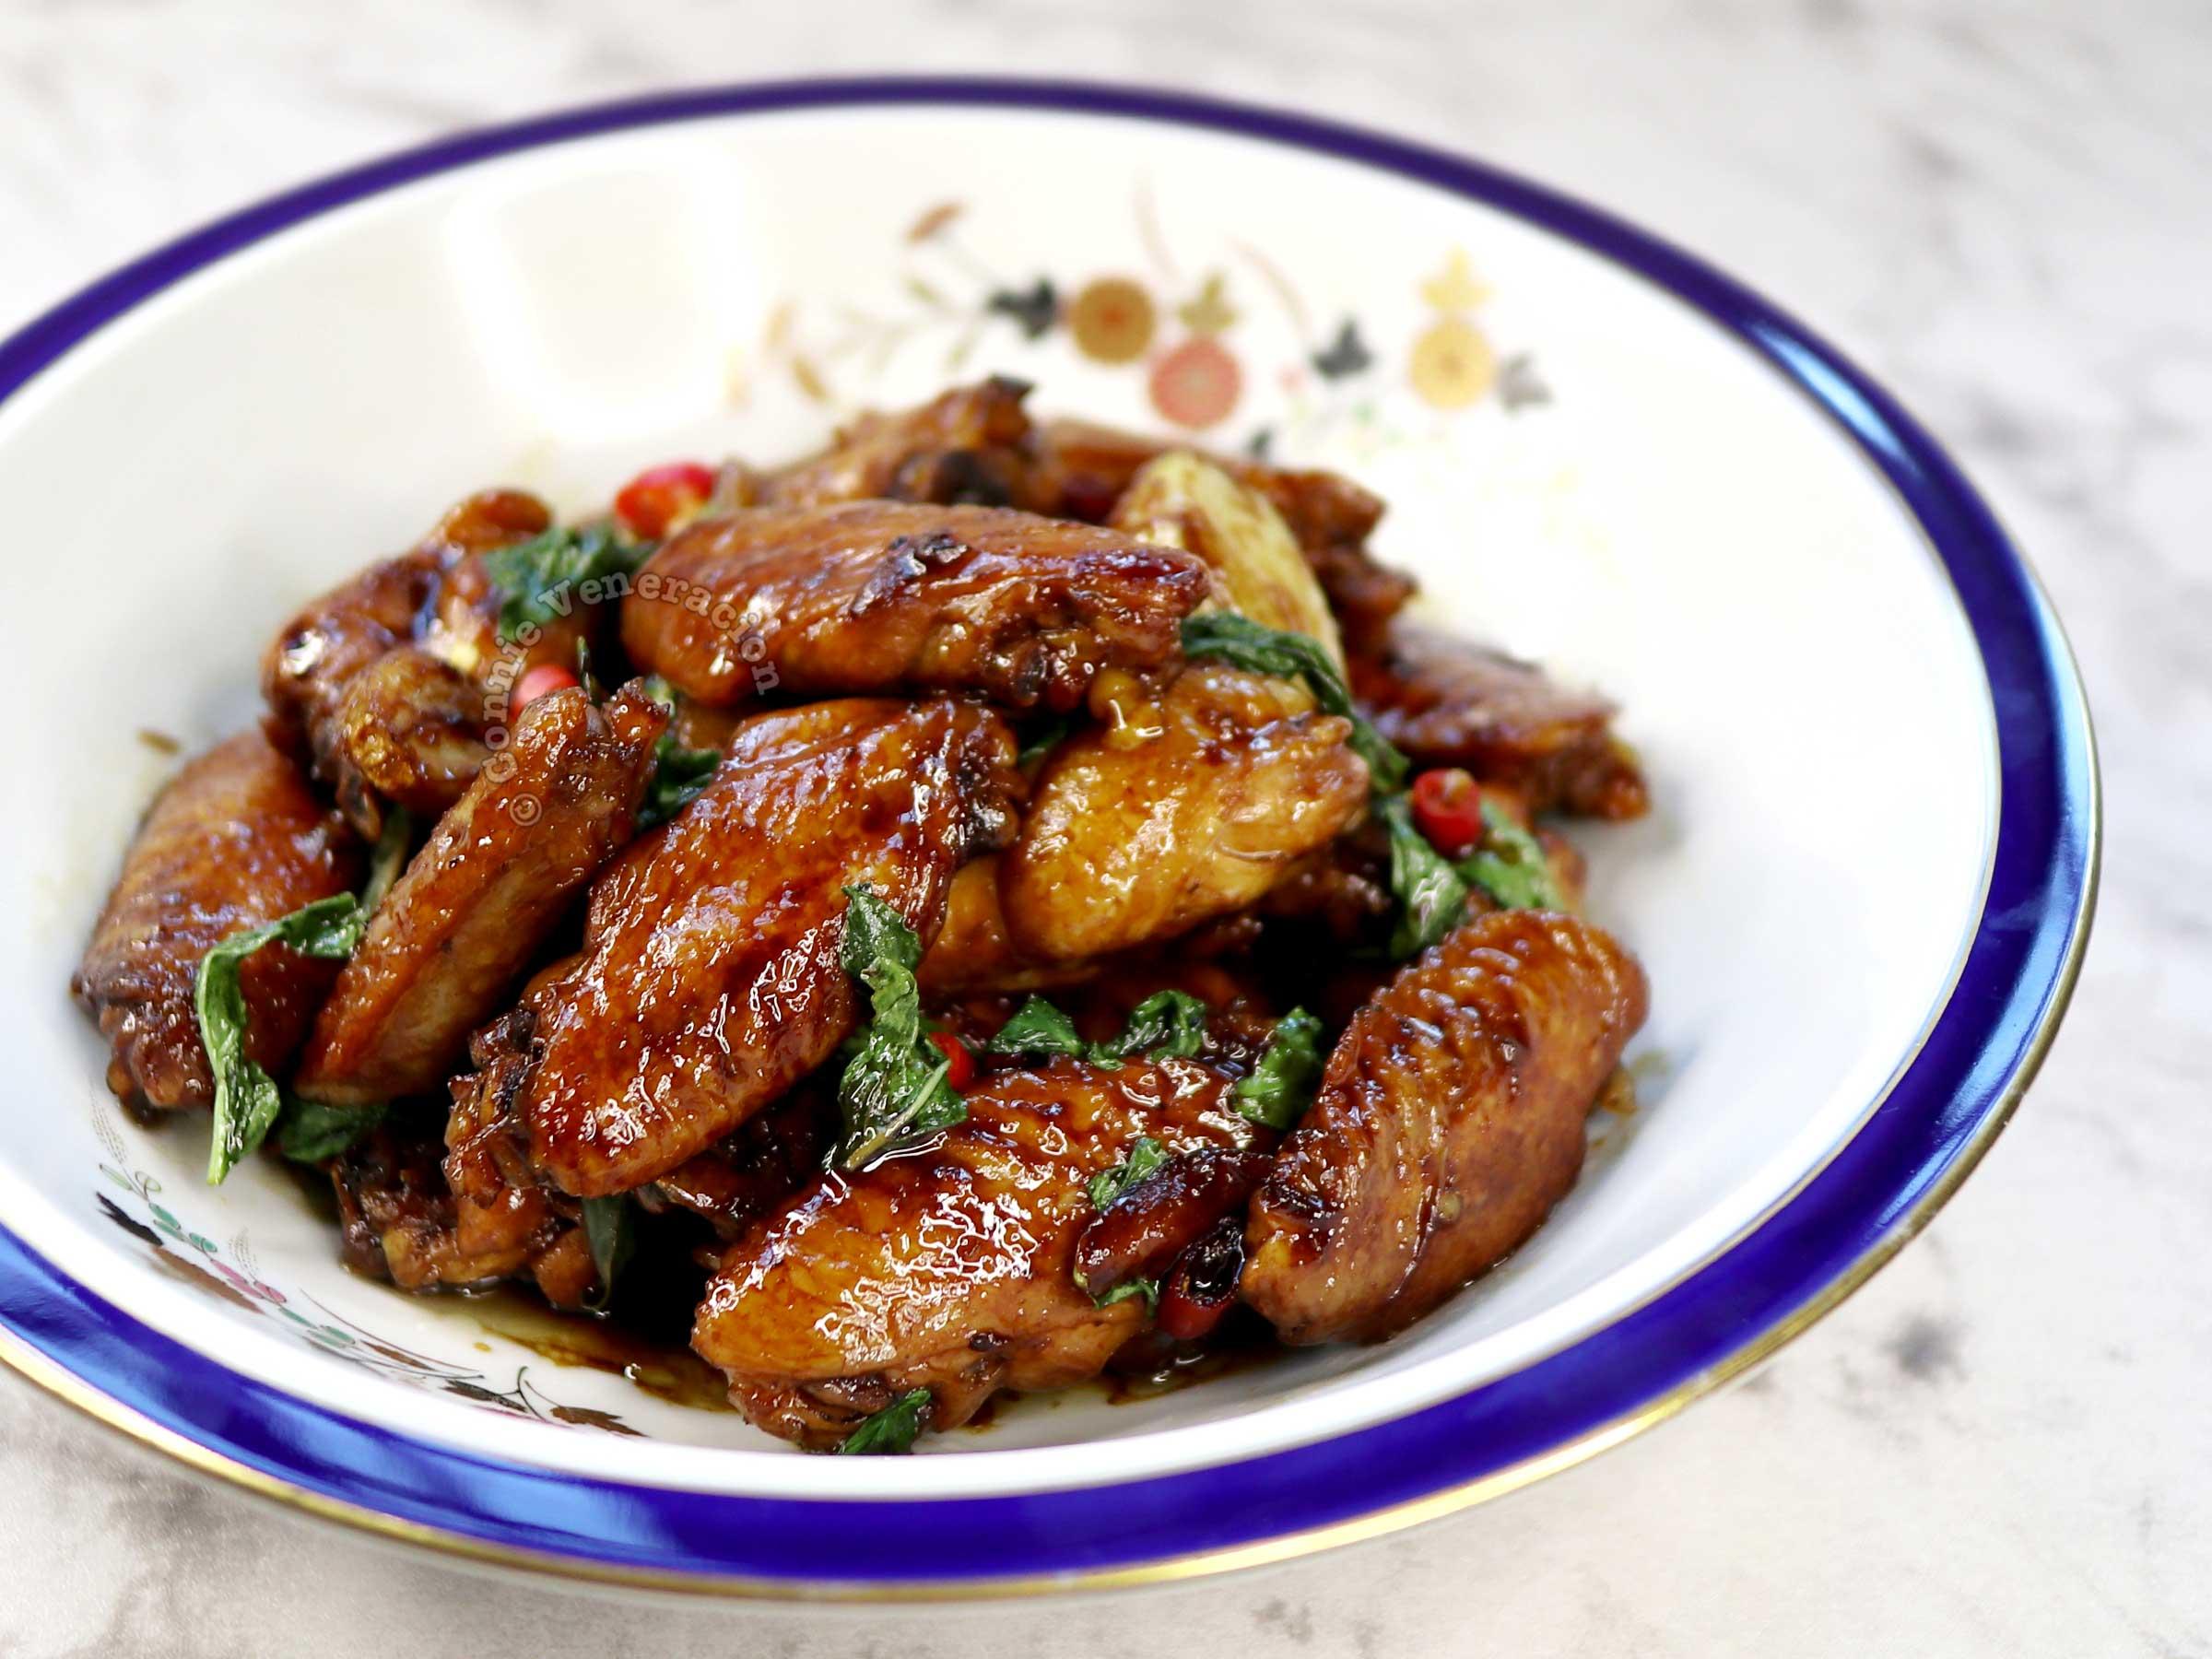 Taiwanese three-cup chicken (san bei ji) recipe